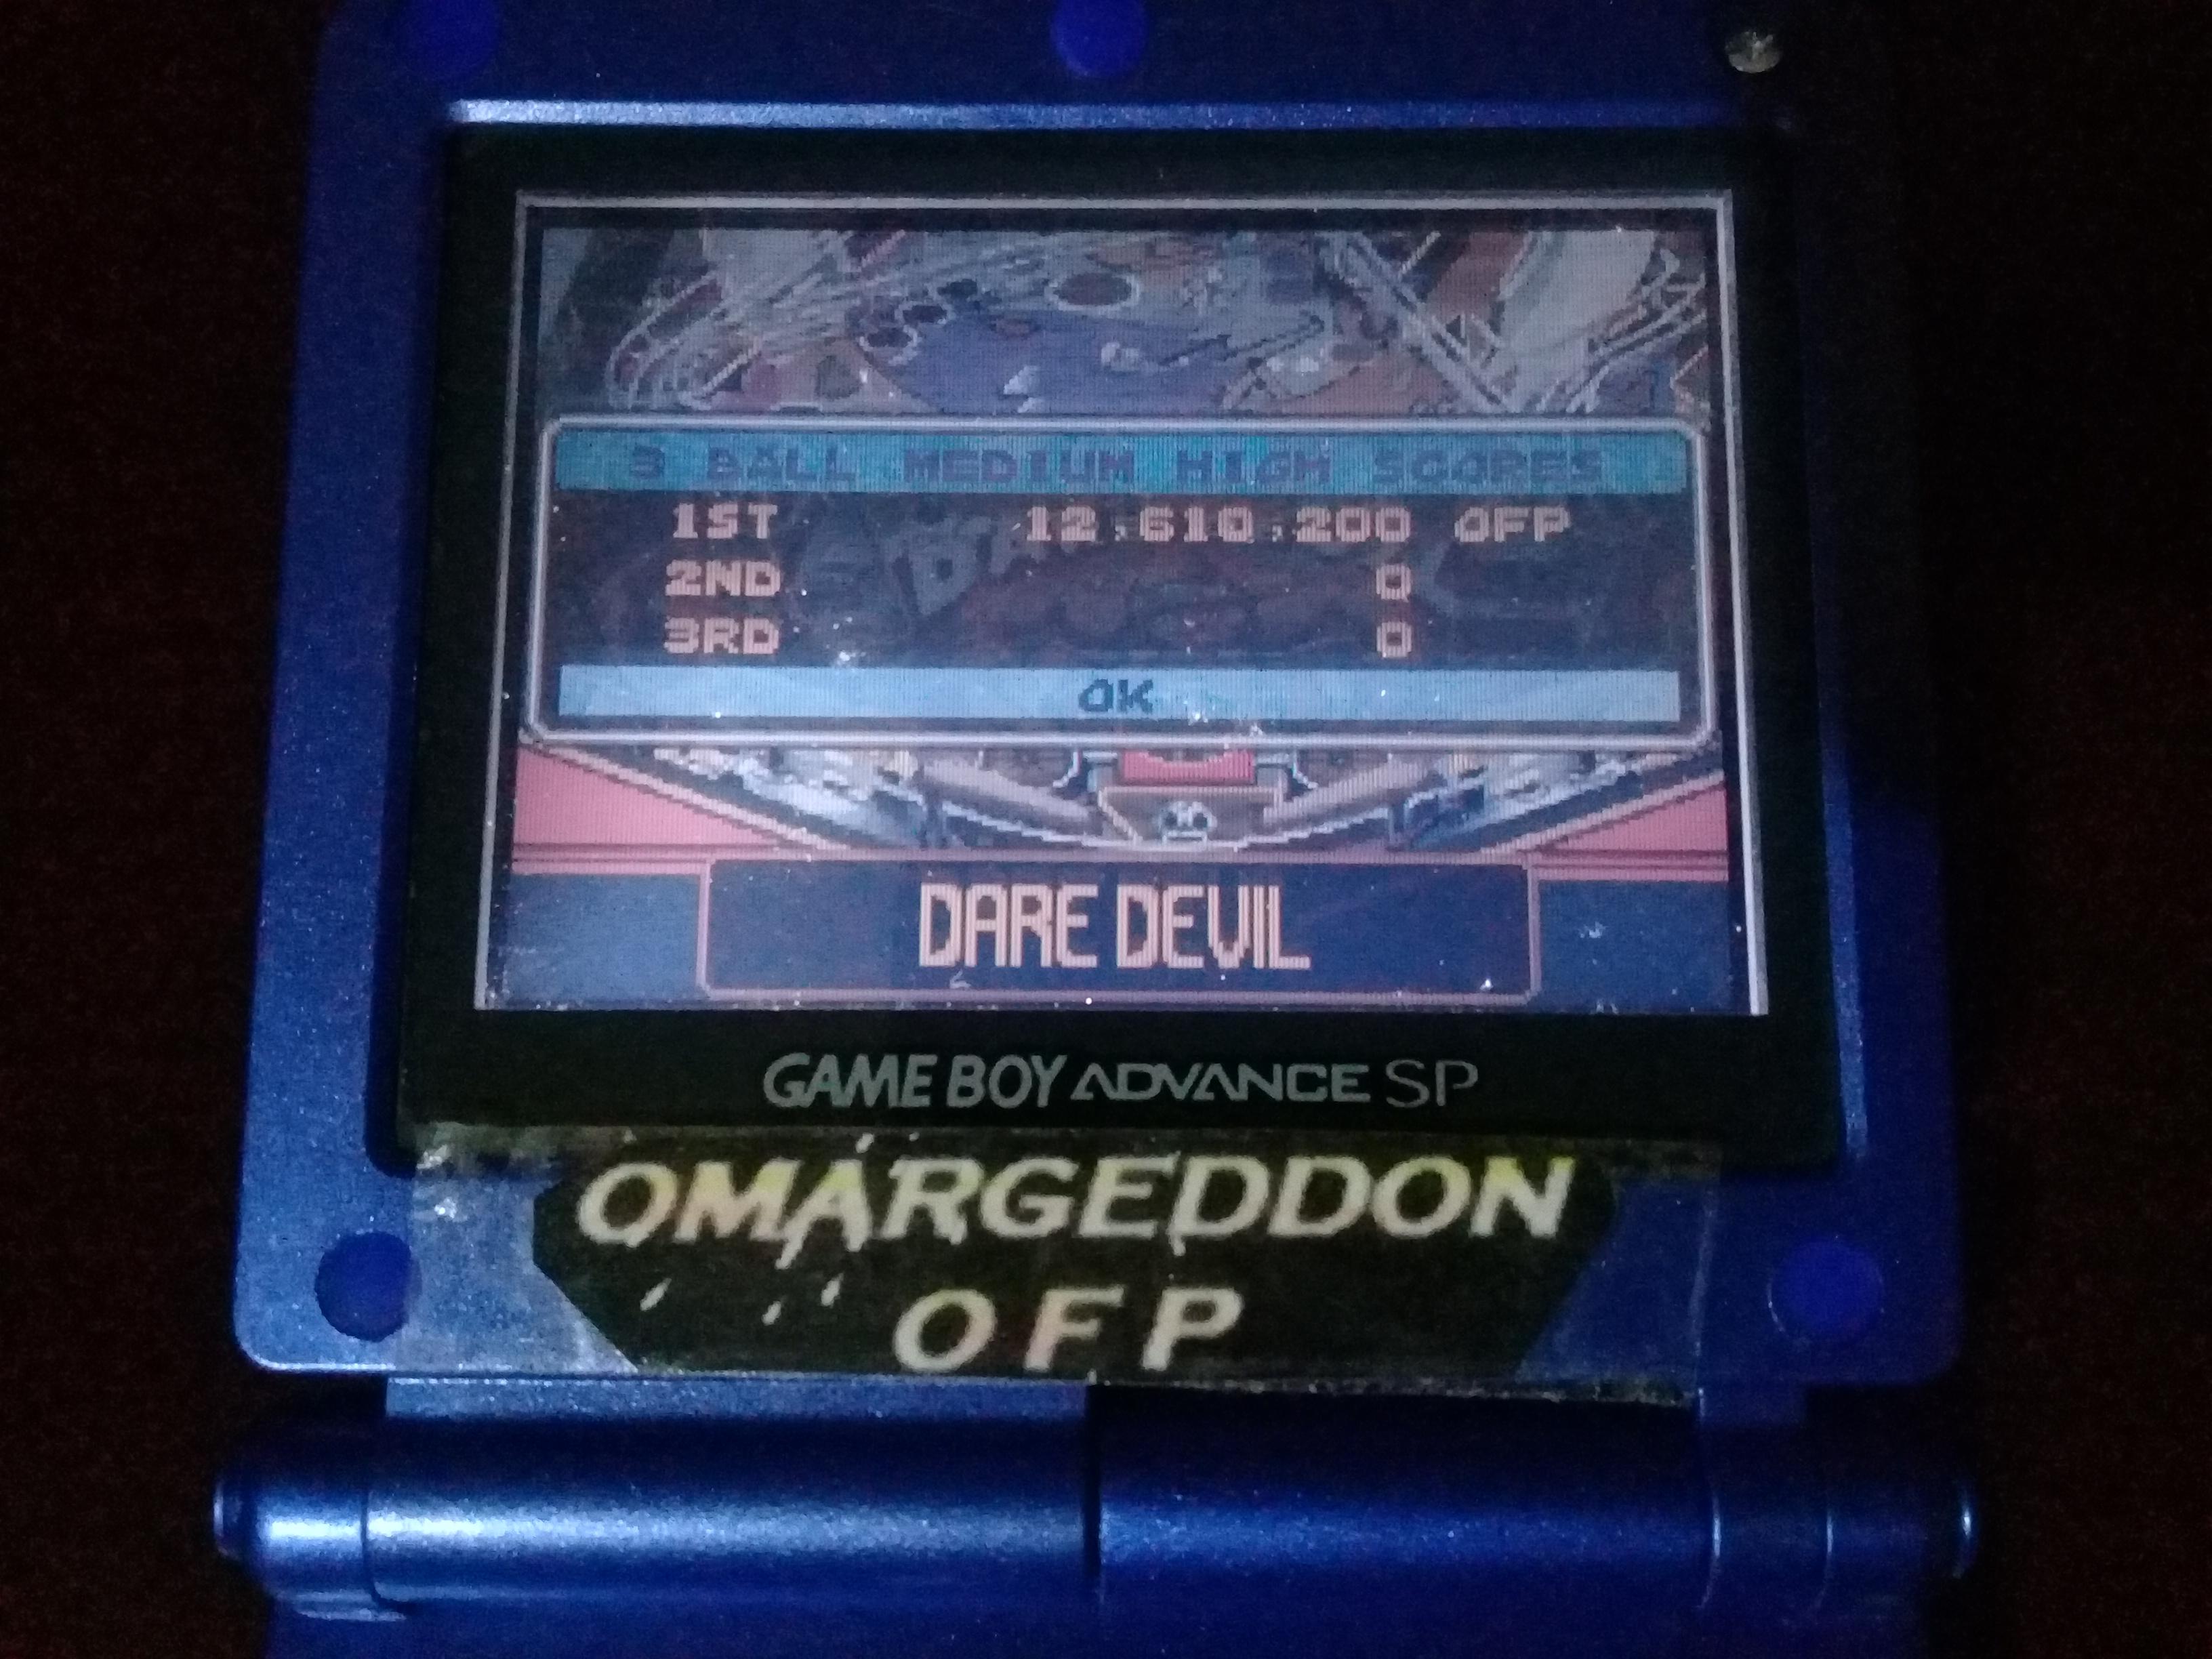 omargeddon: Pinball Advance: Dare Devil [3 Balls] [Medium] (GBA) 12,610,200 points on 2020-12-25 14:16:48